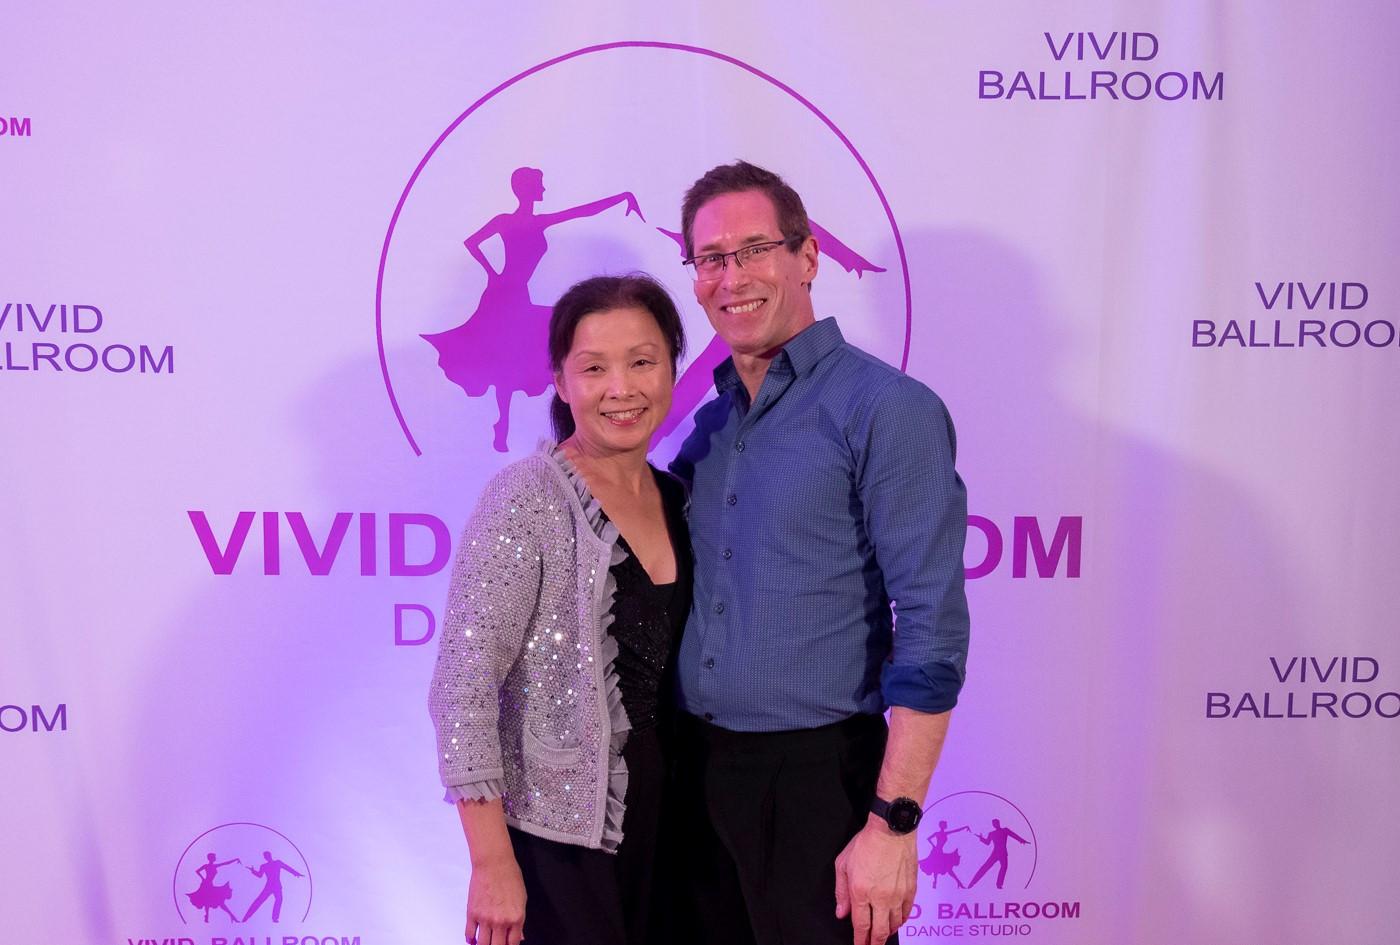 VB_Grand_Opening_Friday_0121.jpg